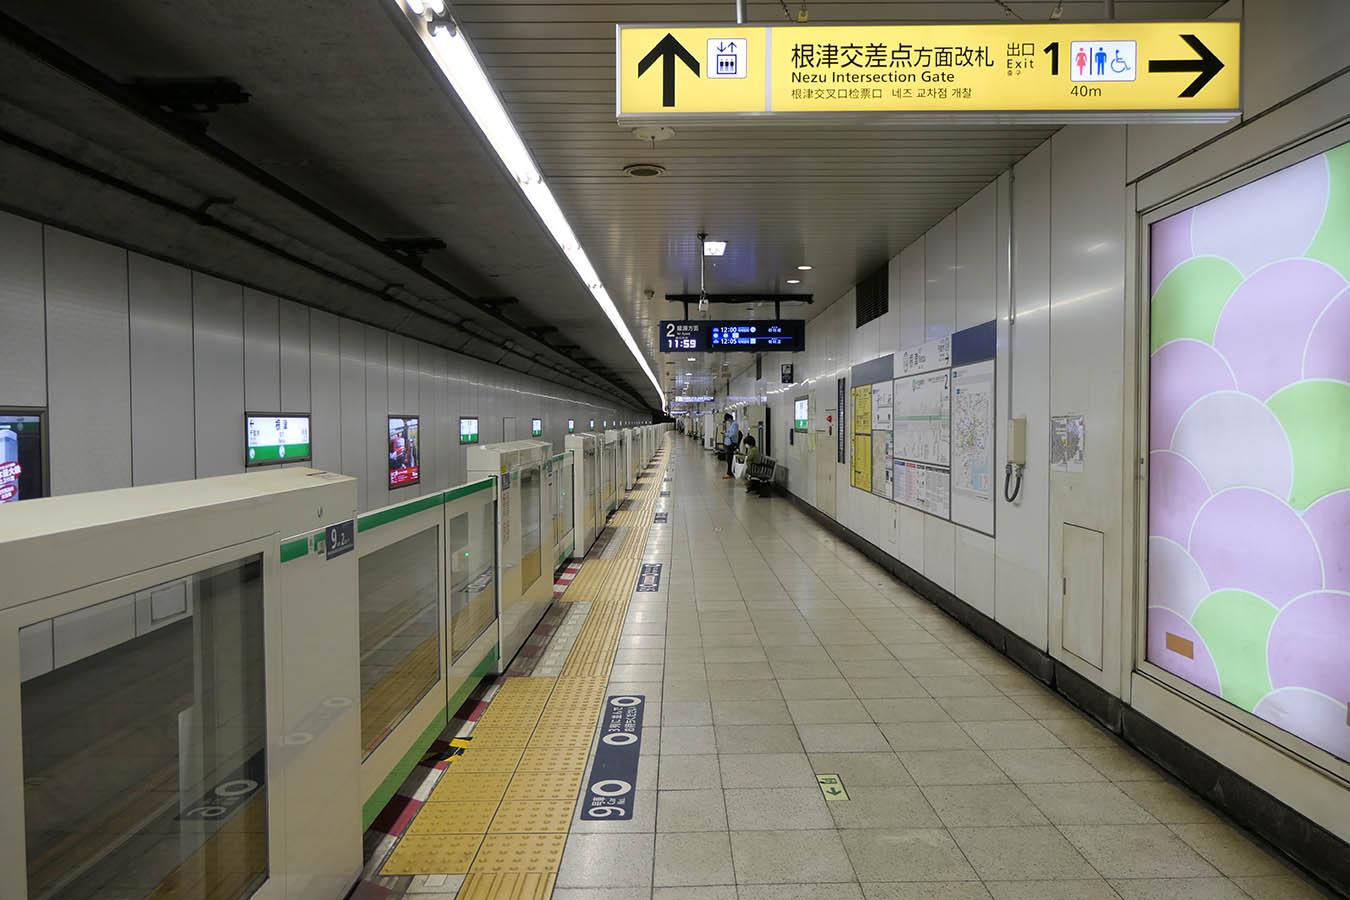 C14_photo04.jpg